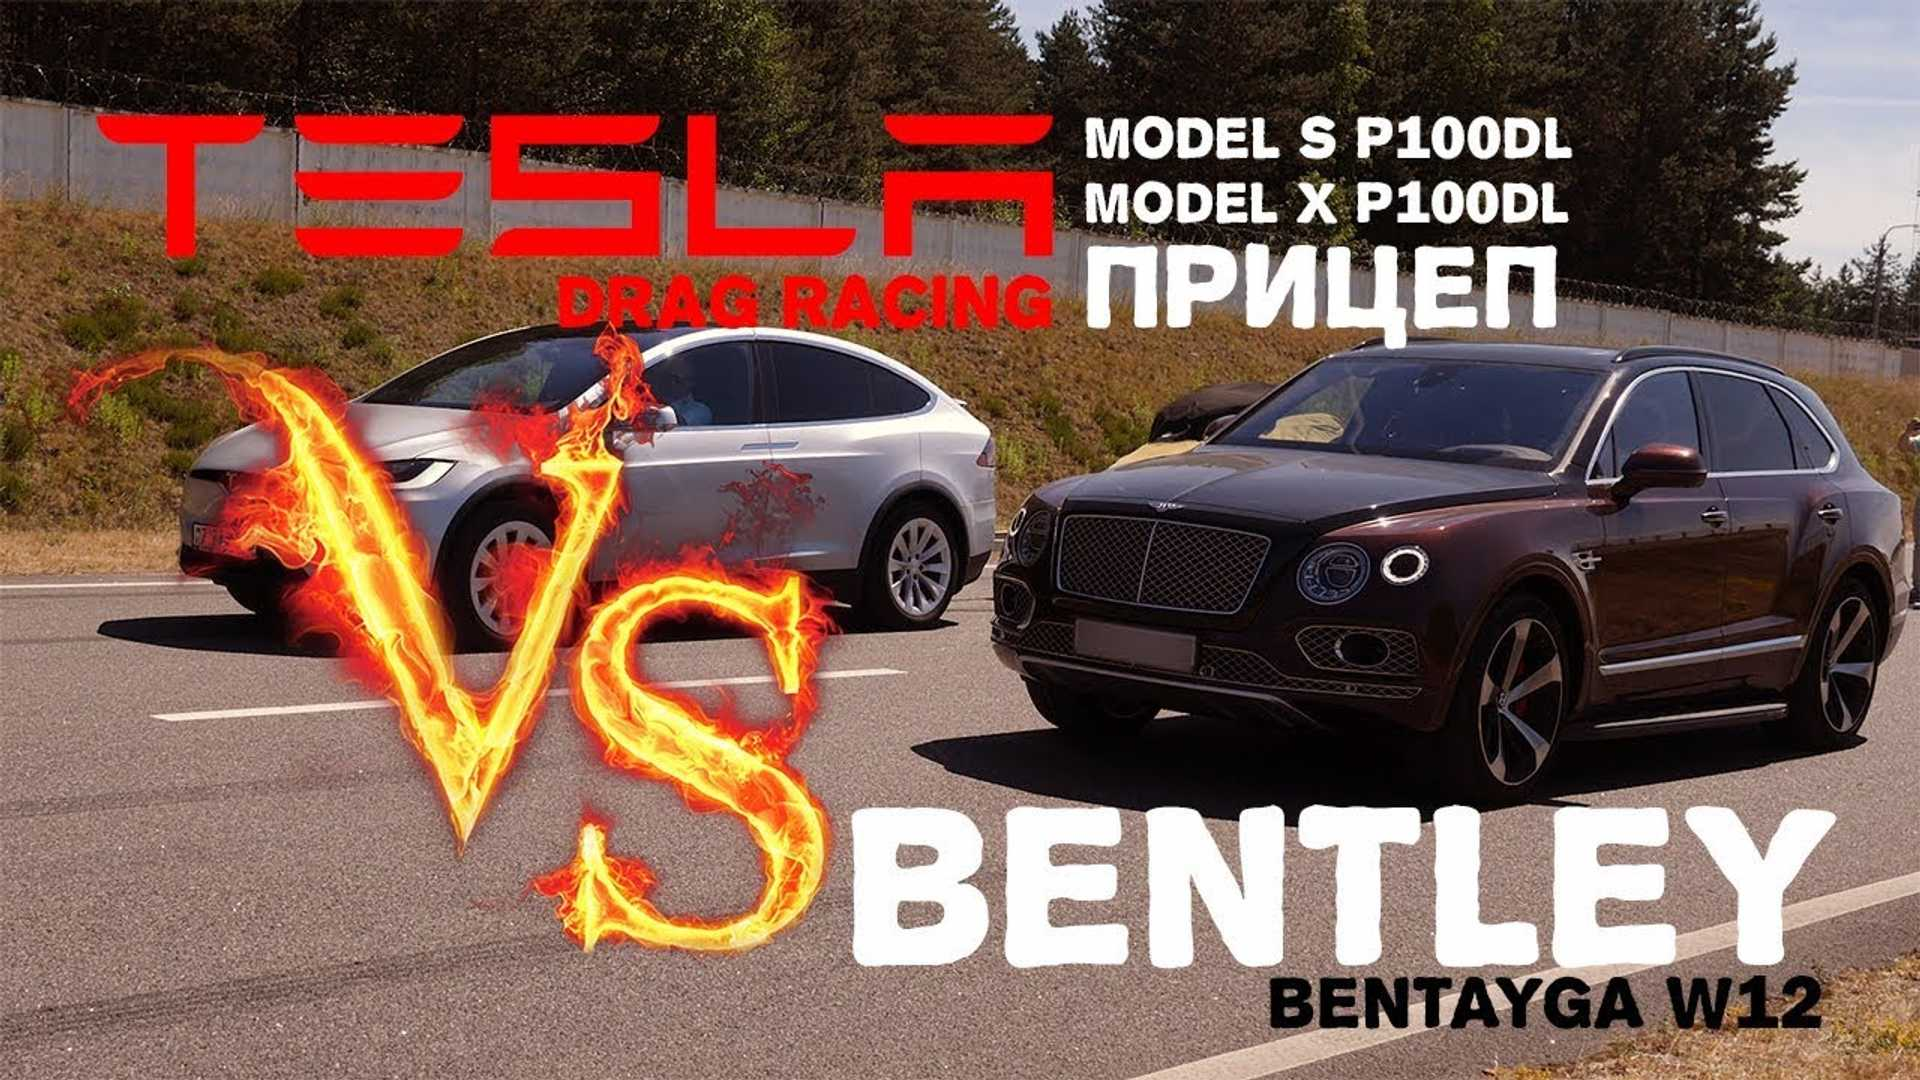 Watch Tesla Model X with trailer in tow race Bentley Bentayga W12